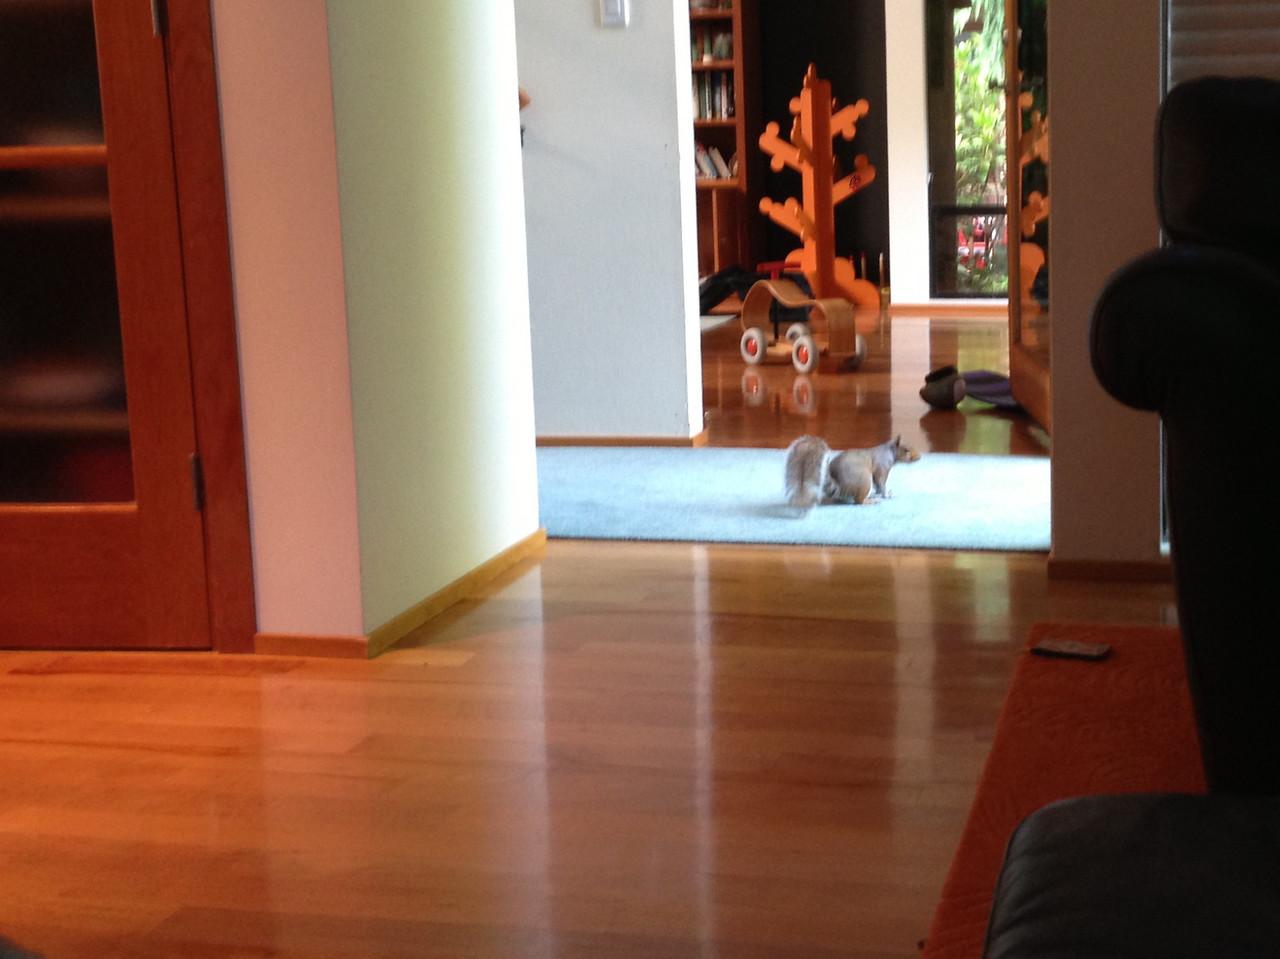 Intruder!